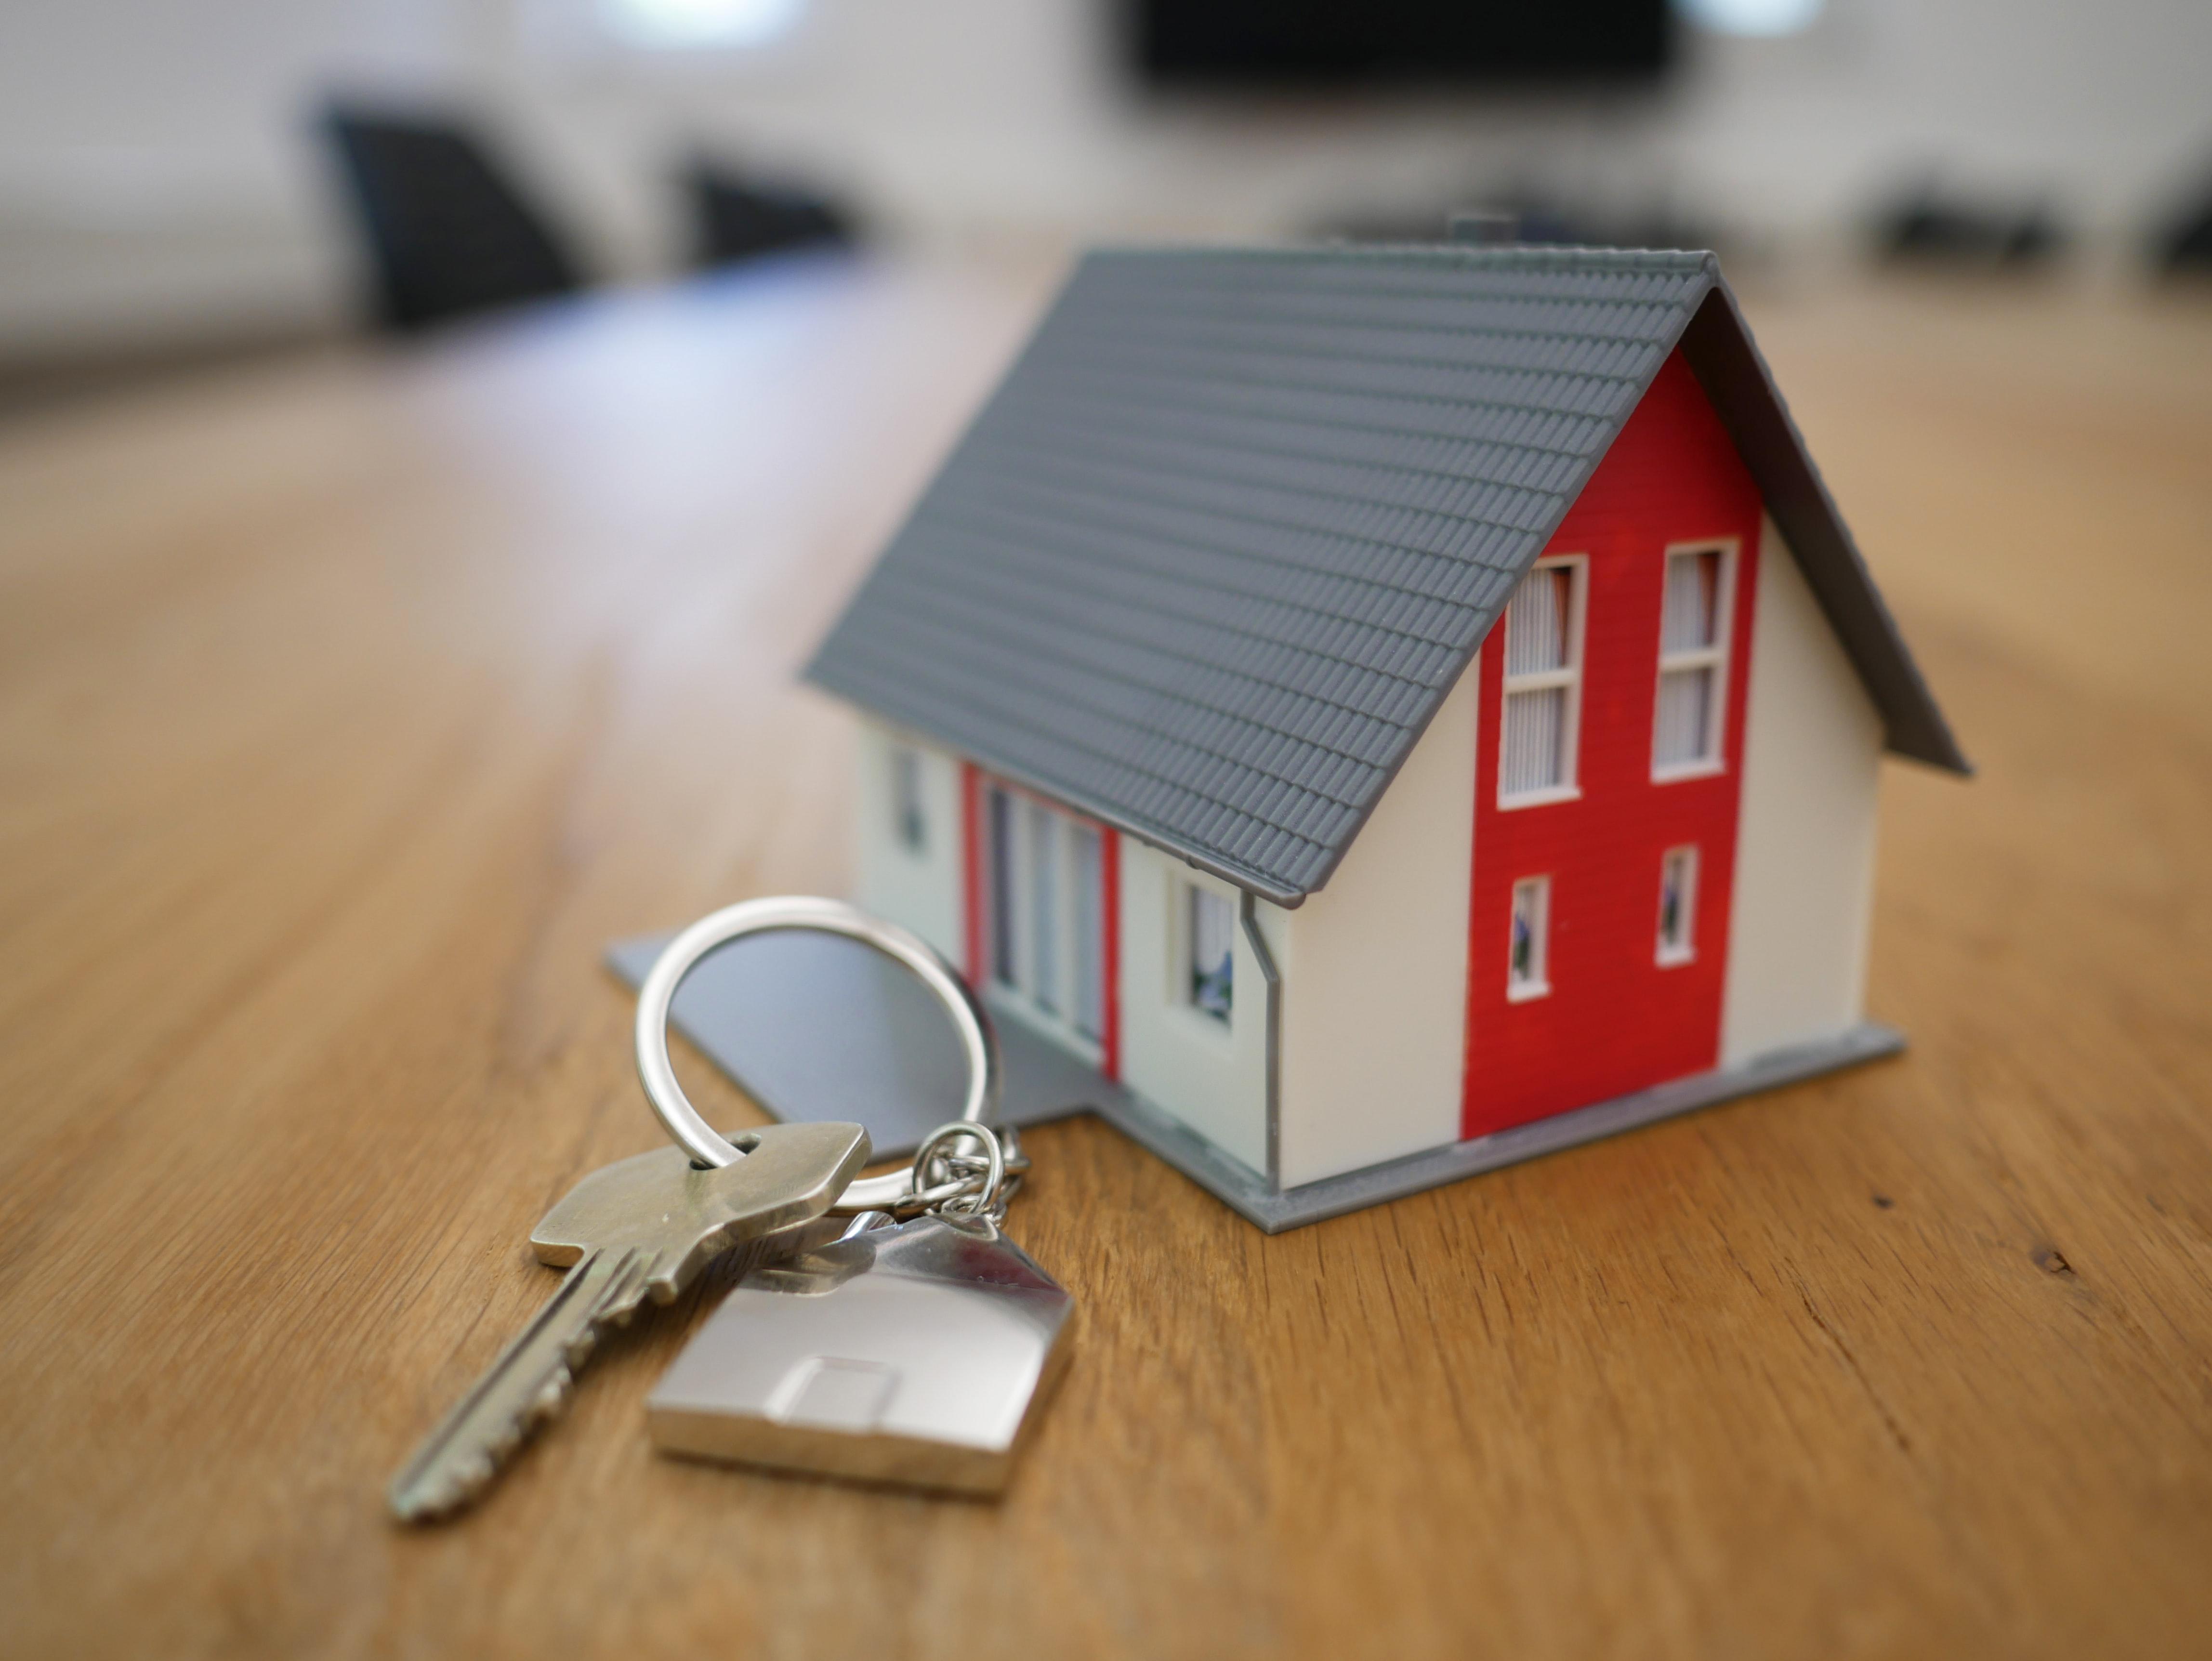 tierra mallorca rgJ1J8SDEAY unsplash - Når du skal sælge din bolig